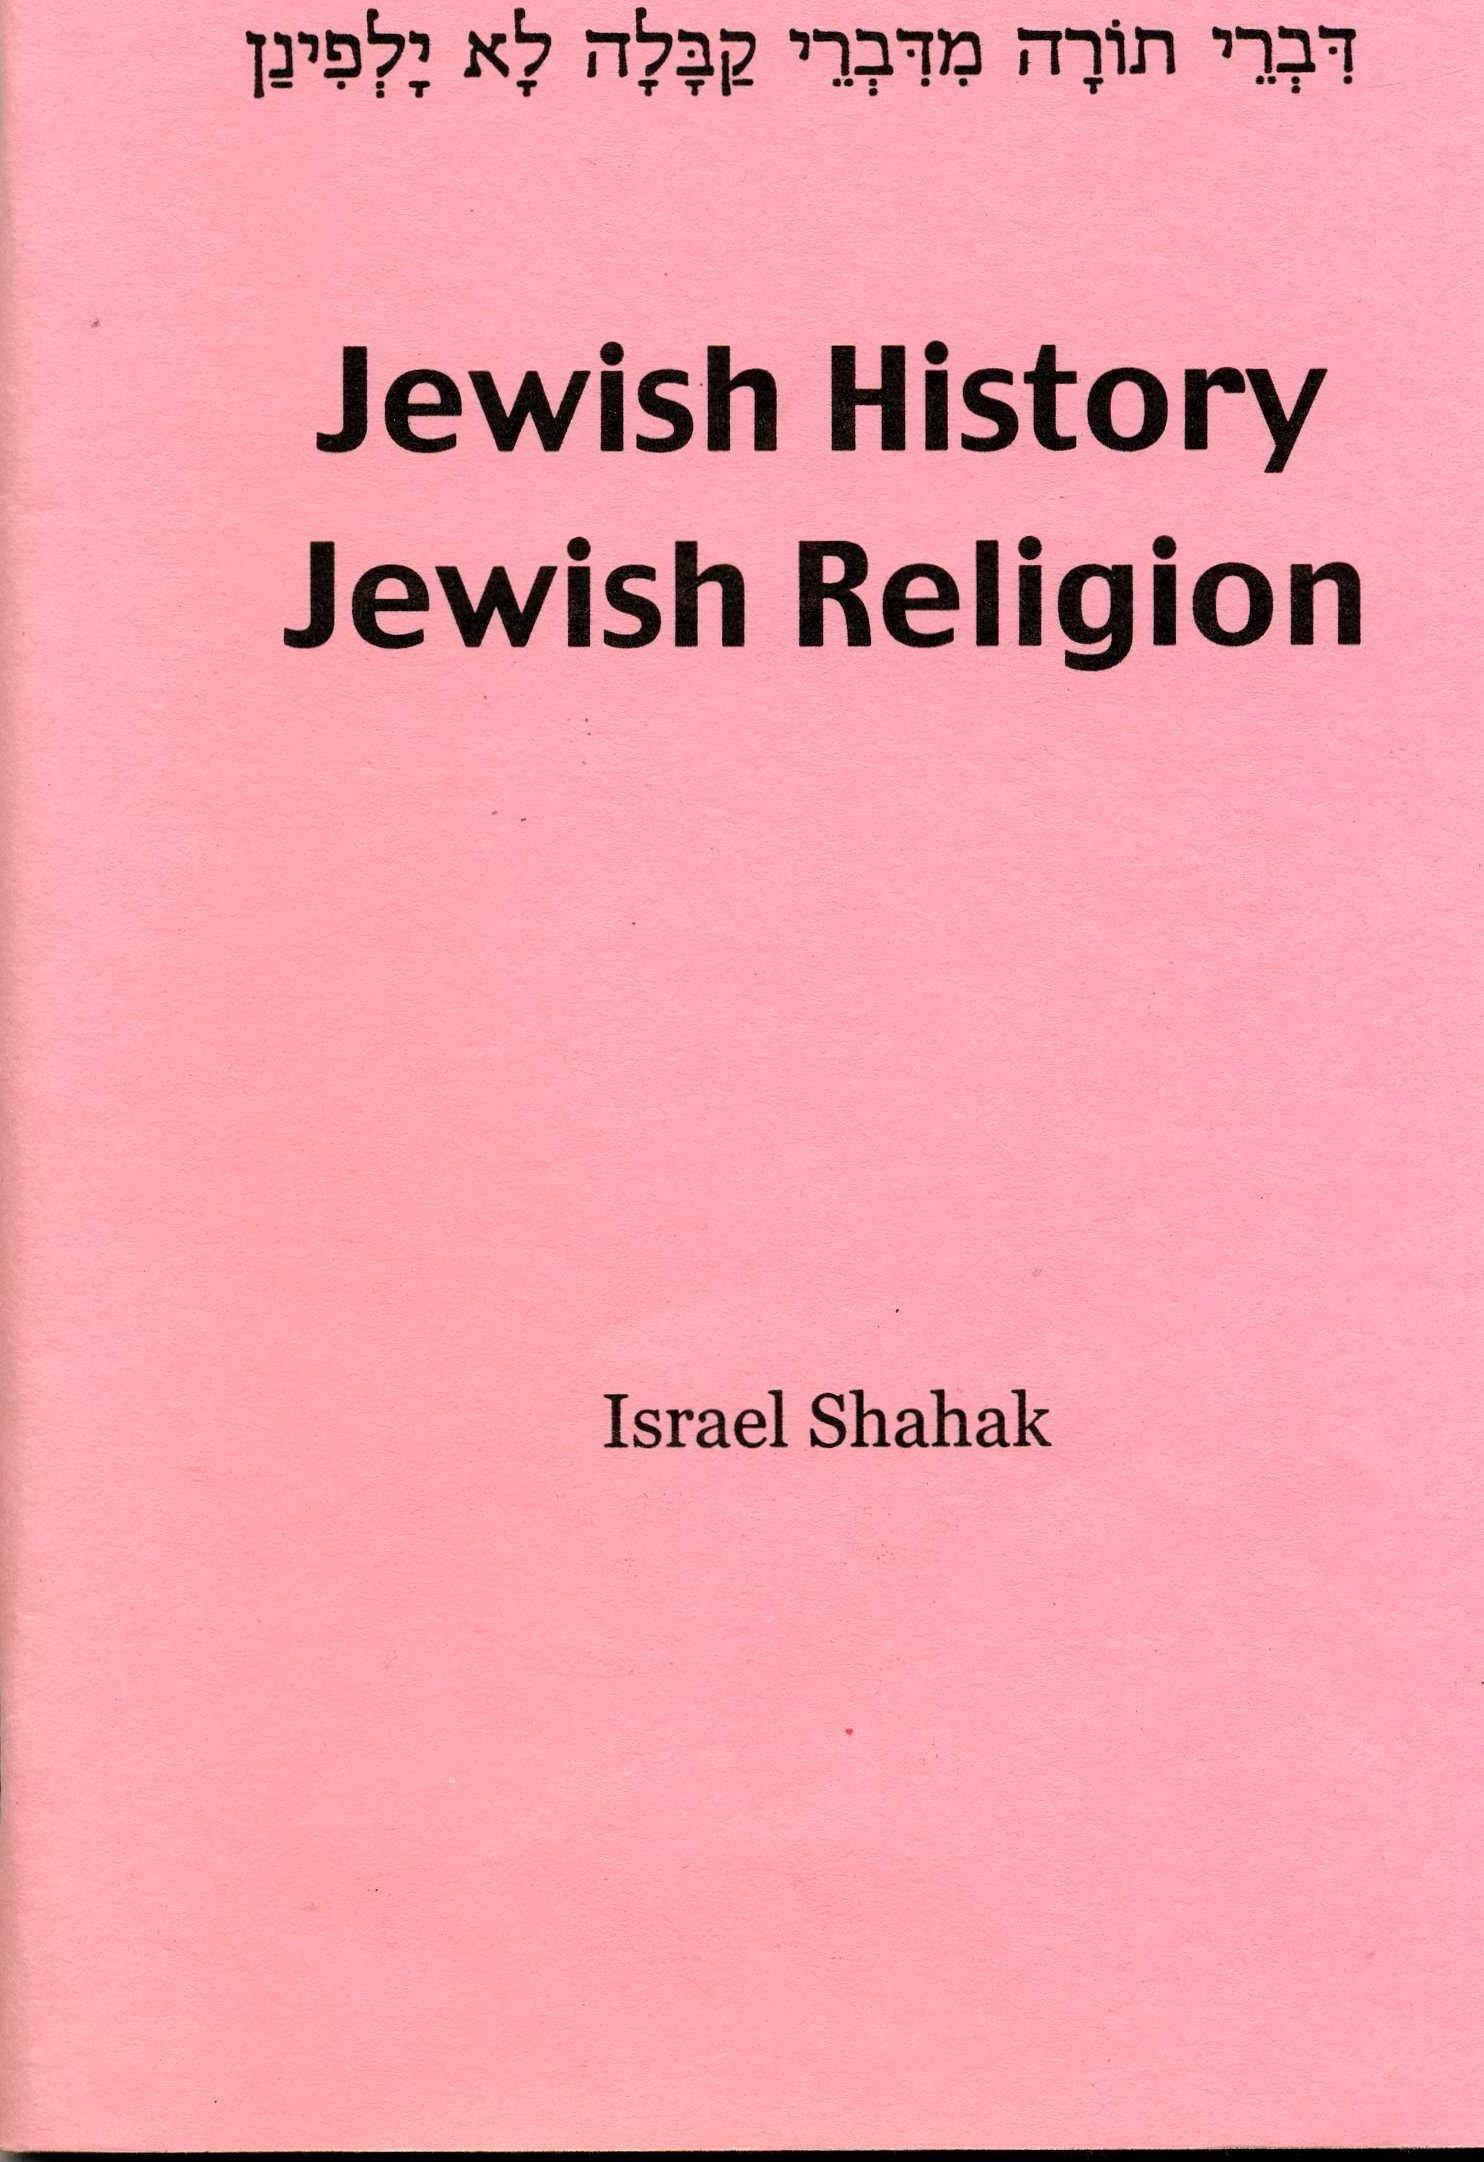 Jewish History, Jewish Religion: Israel; Vidal, Gore Shahak: Amazon.com:  Books